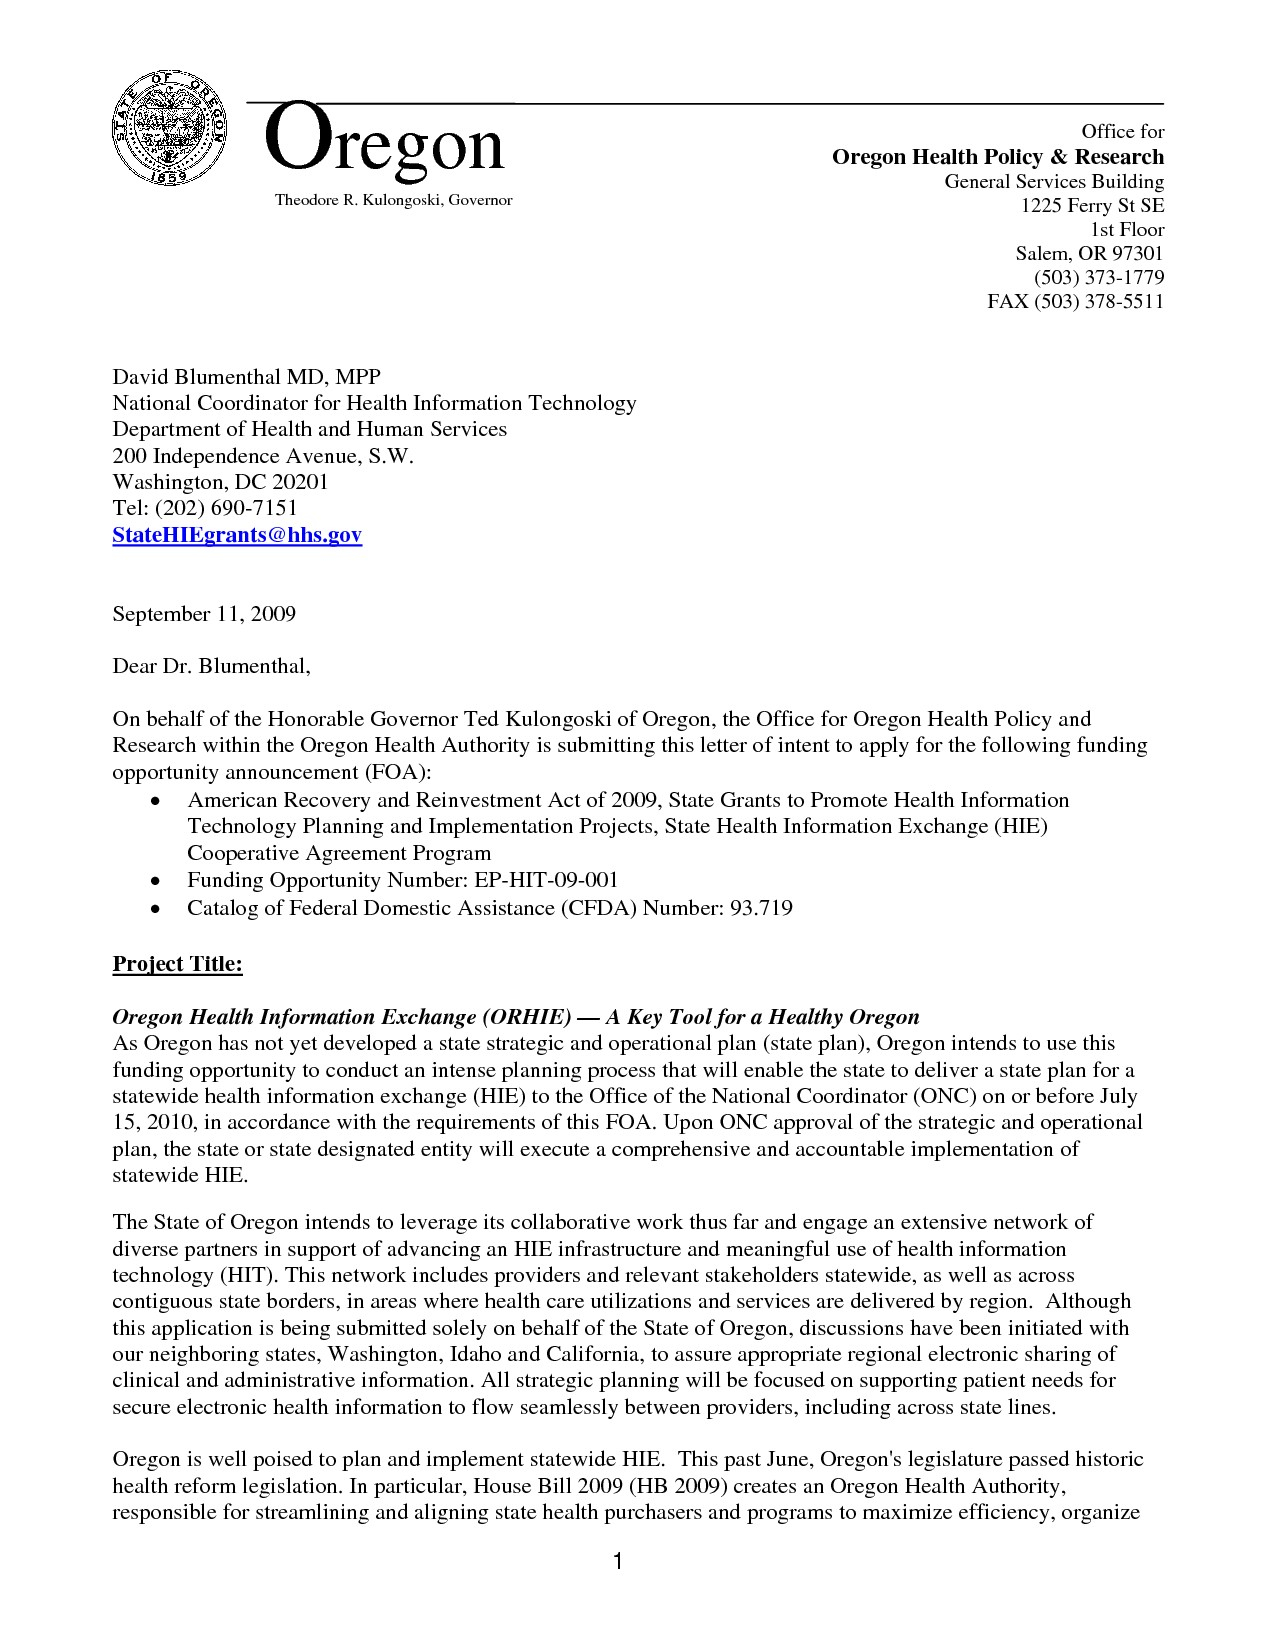 Letter Of Intent Template Business Partnership - Letter Intent Template Business Partnership Save Unique Business